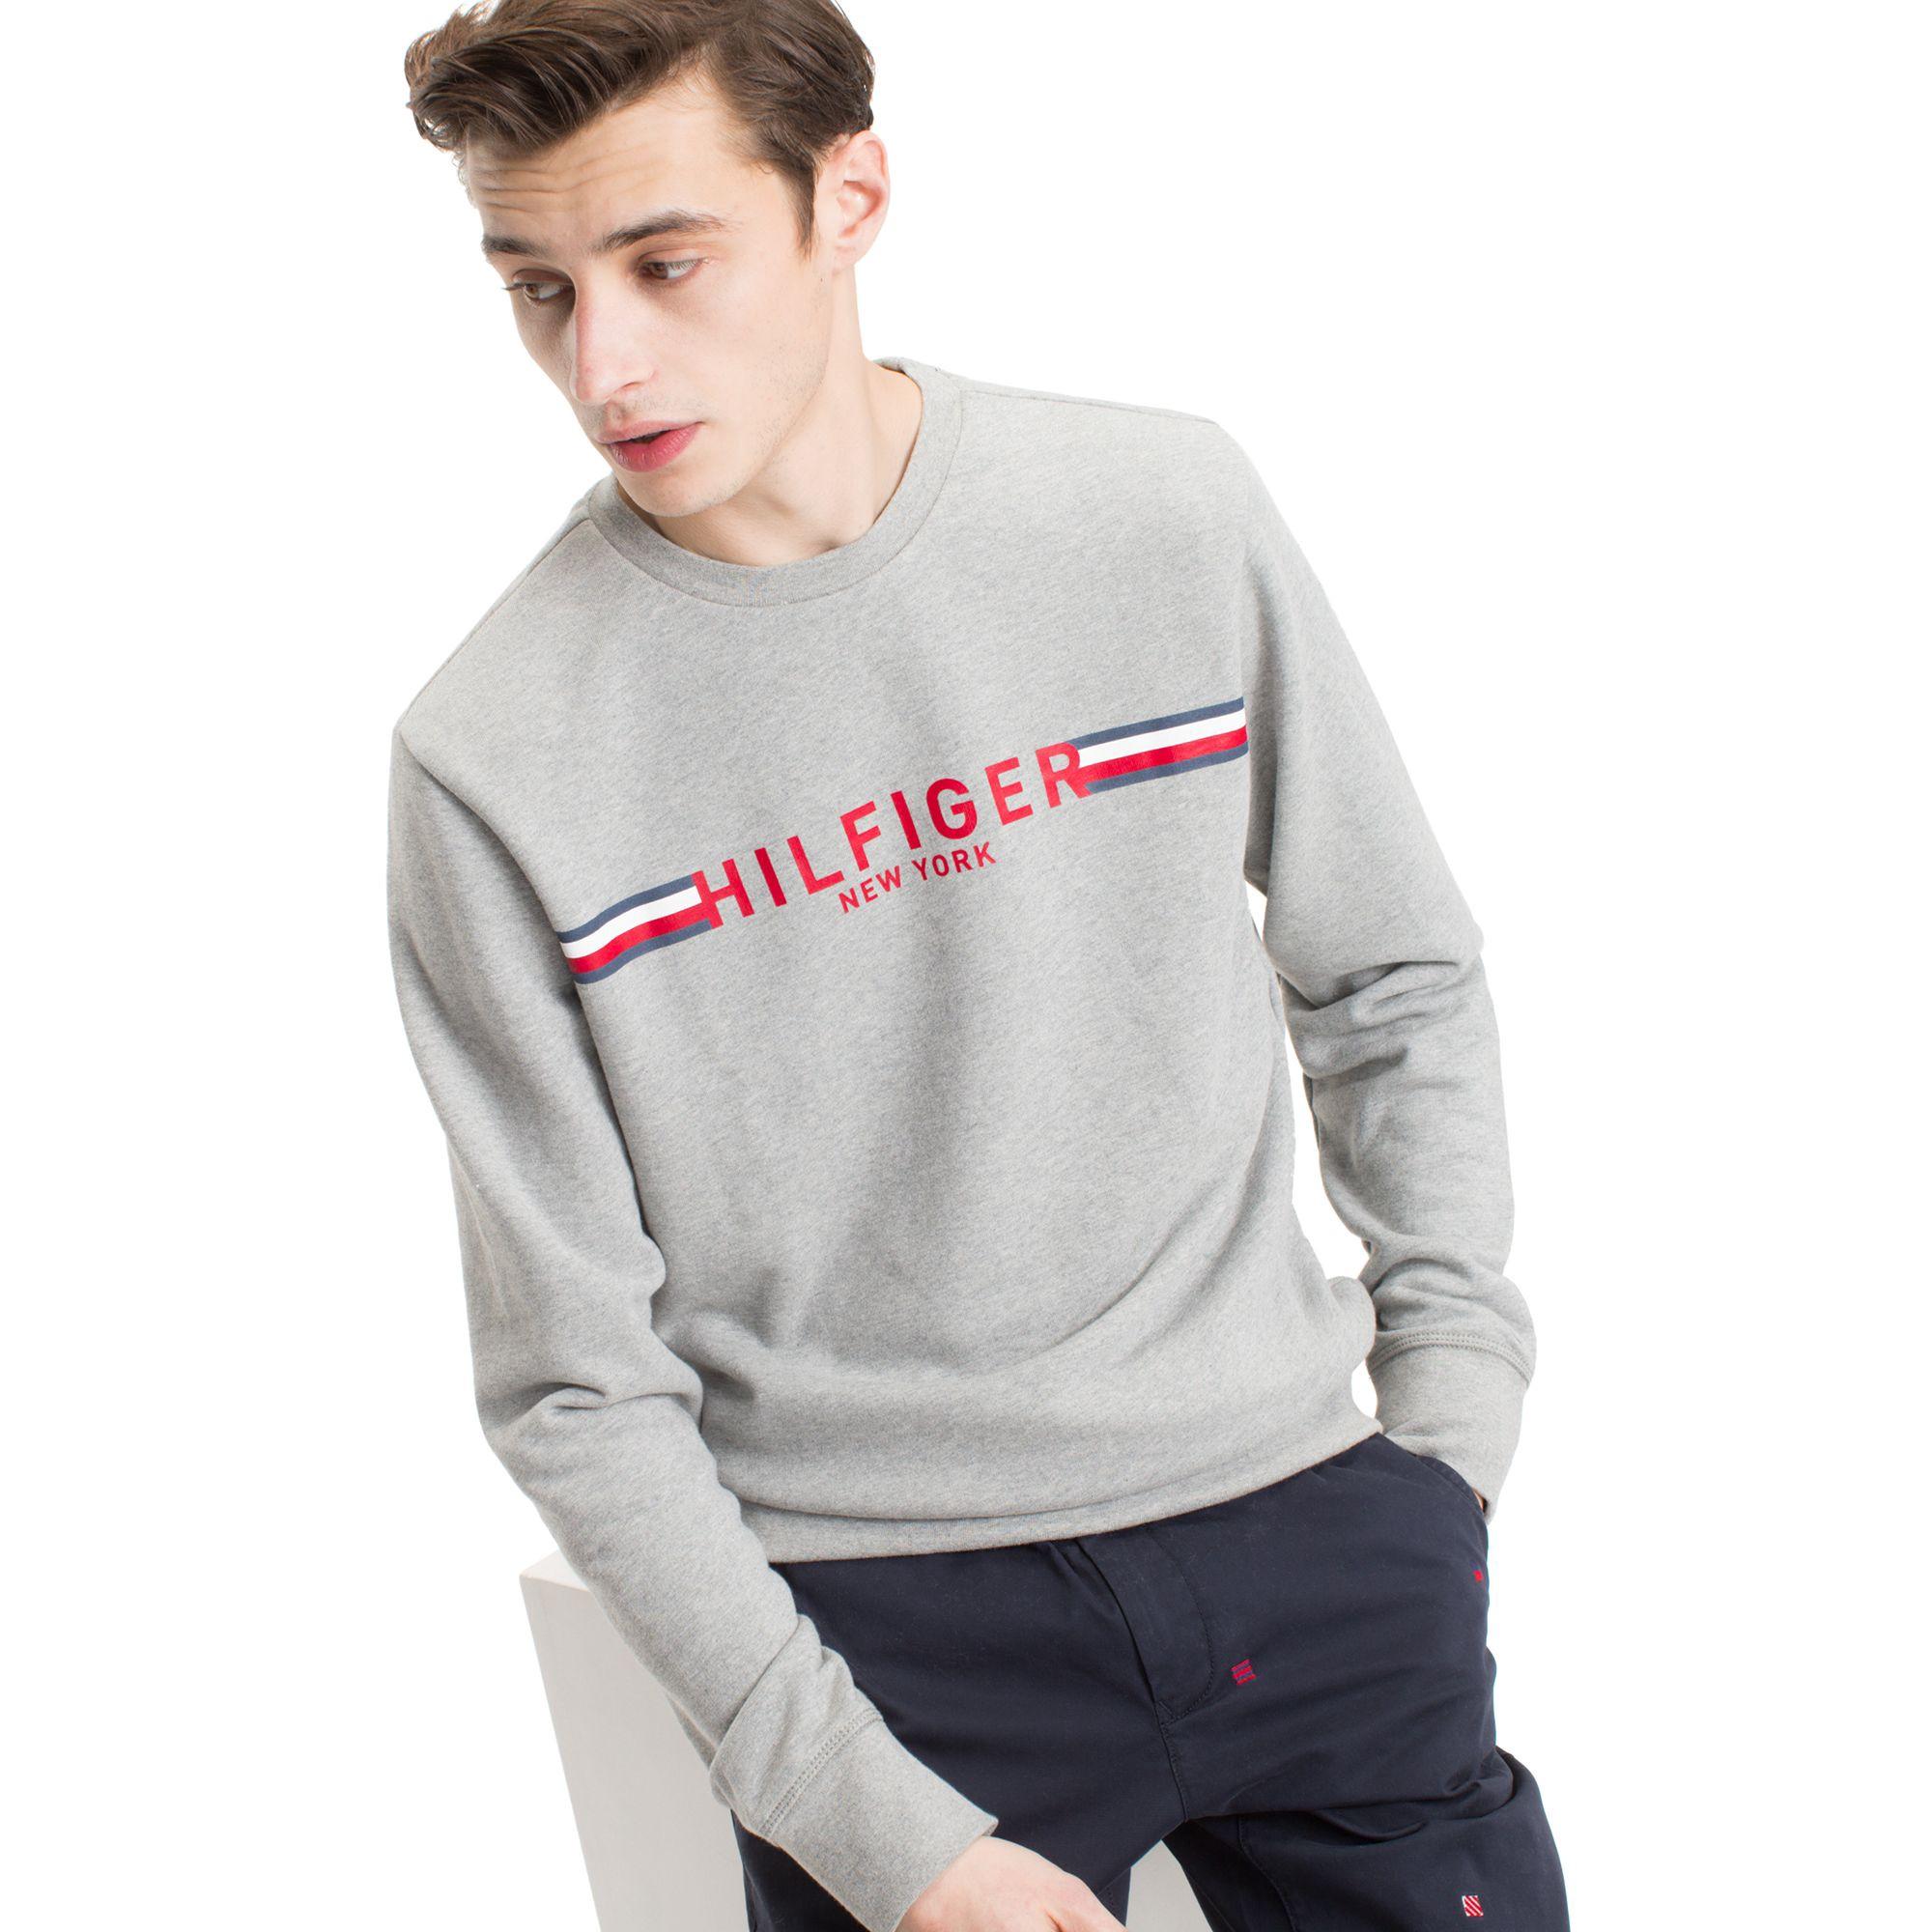 Tommy Hilfiger Crewneck Sweatshirt Sky Captain S Sweatshirts Crew Neck Sweatshirt Hilfiger [ 2000 x 2000 Pixel ]